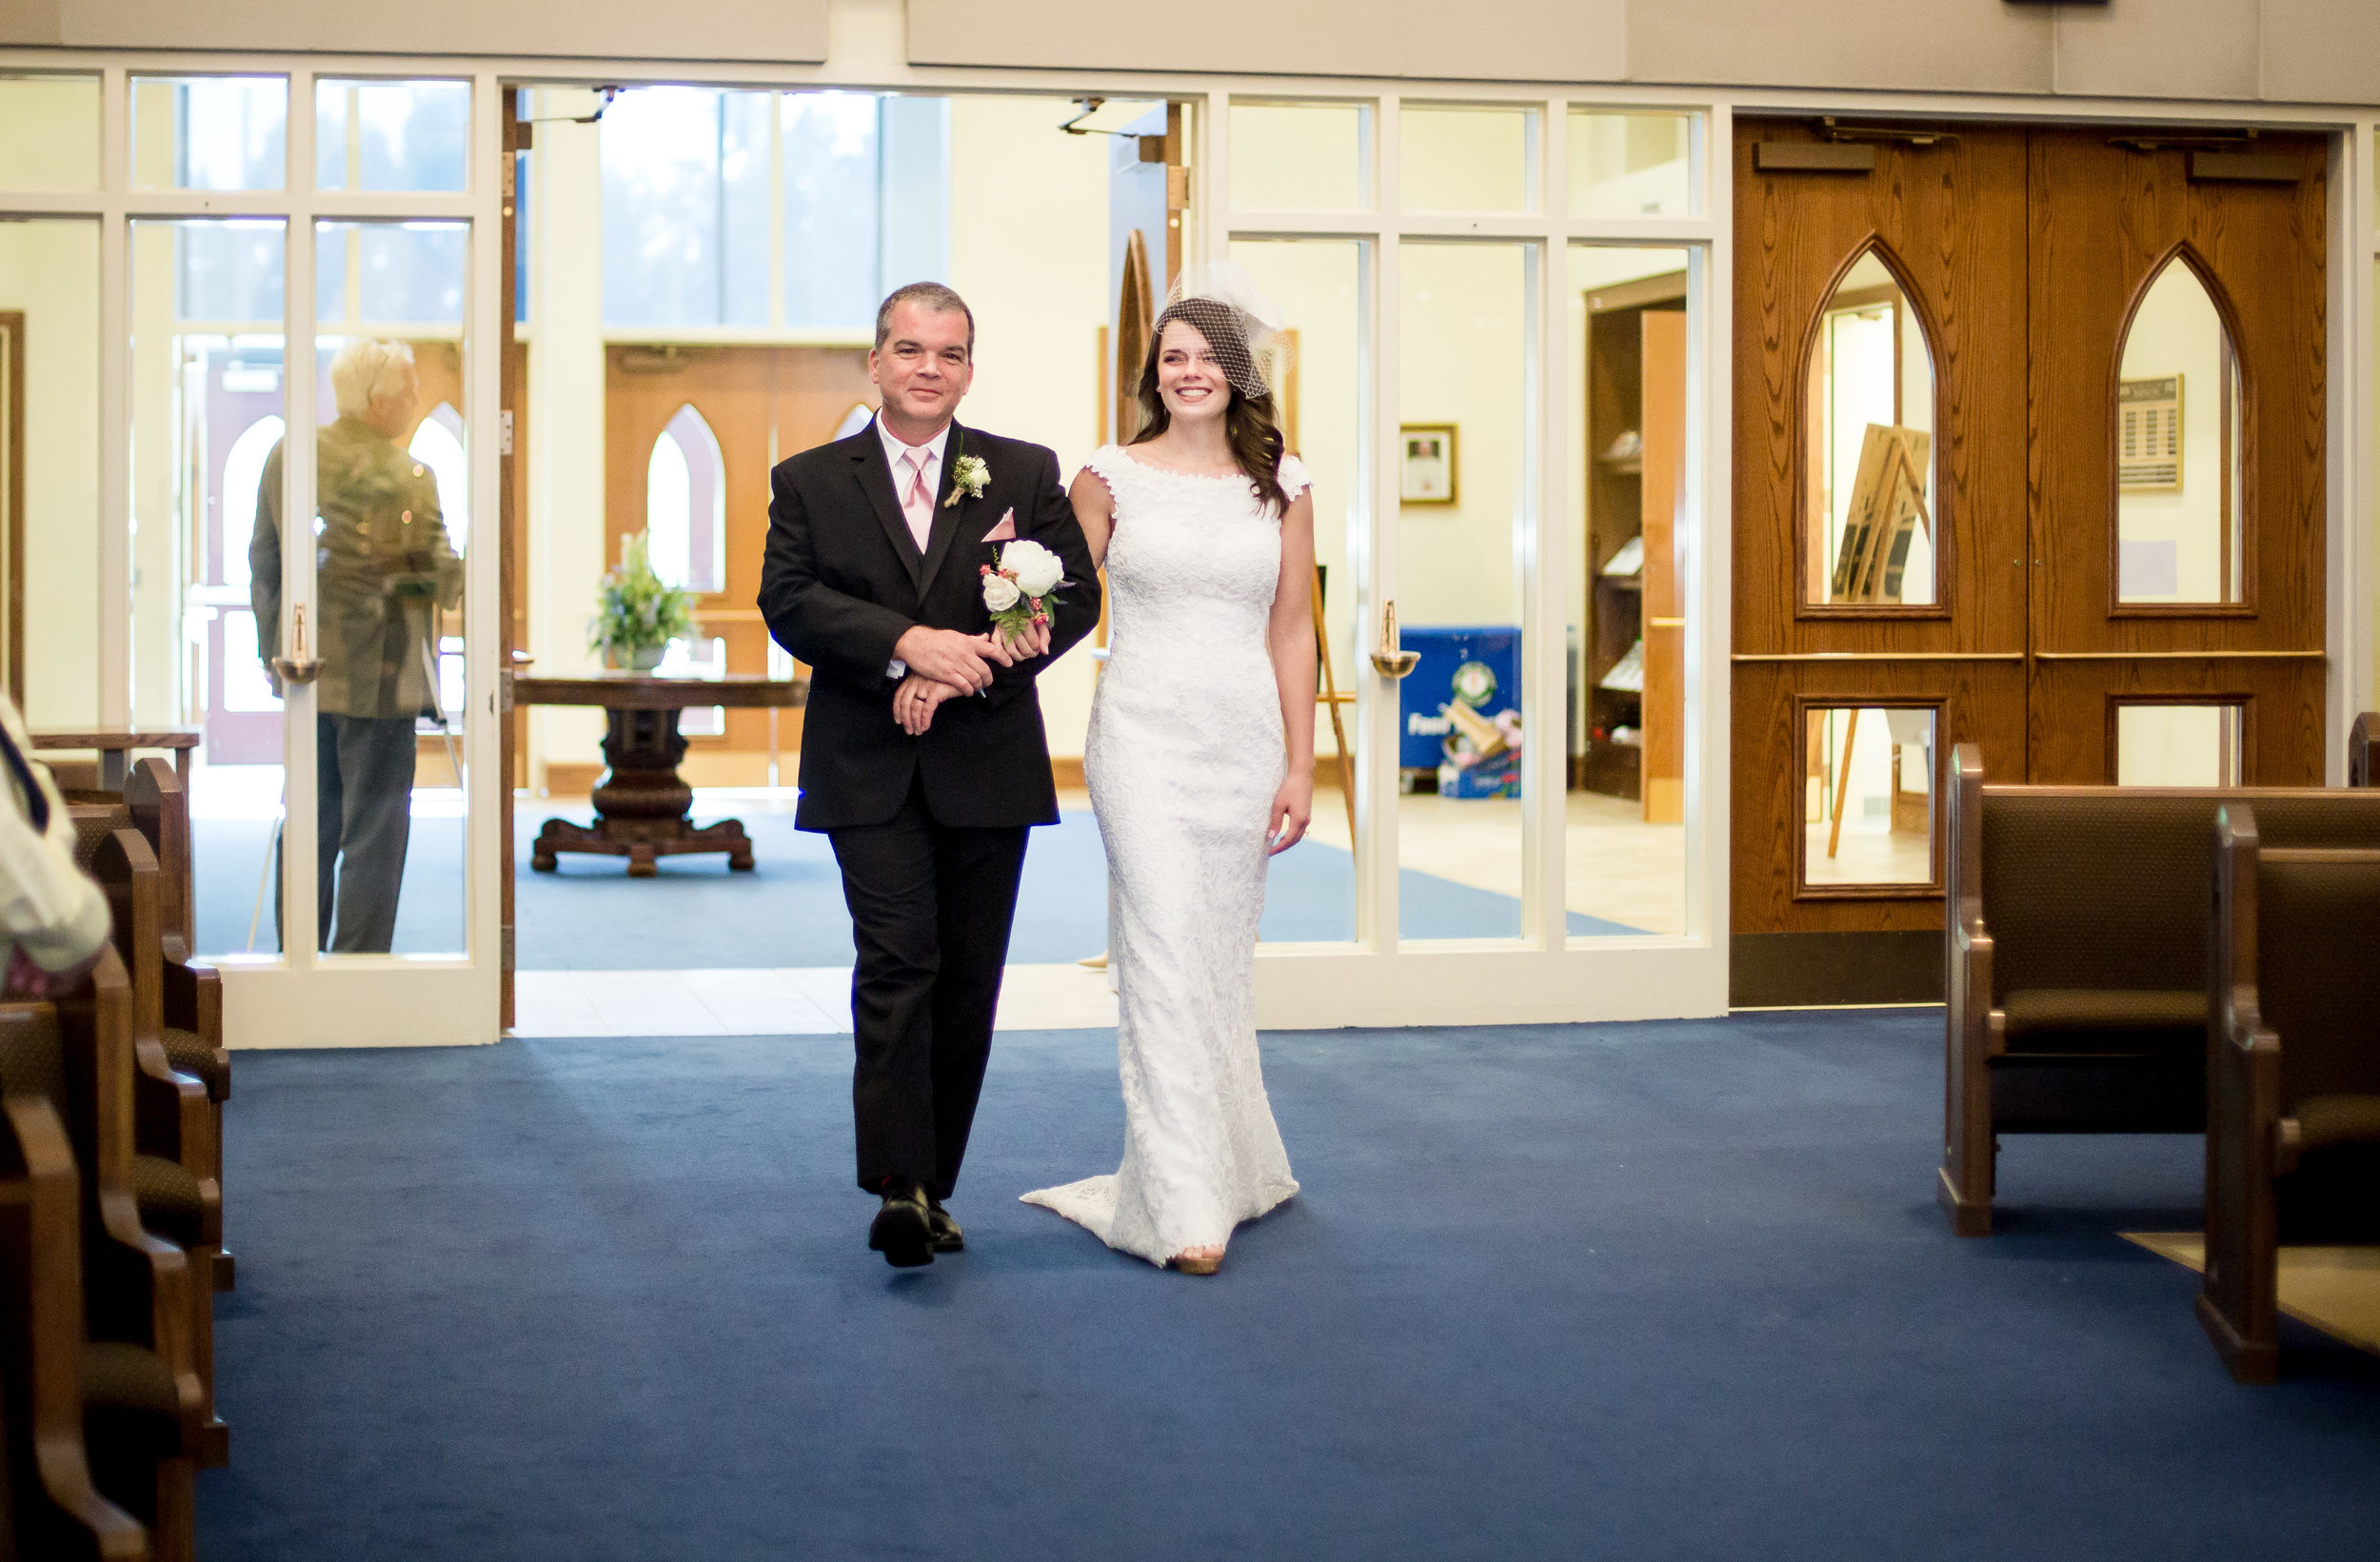 wedding (71 of 126).jpg